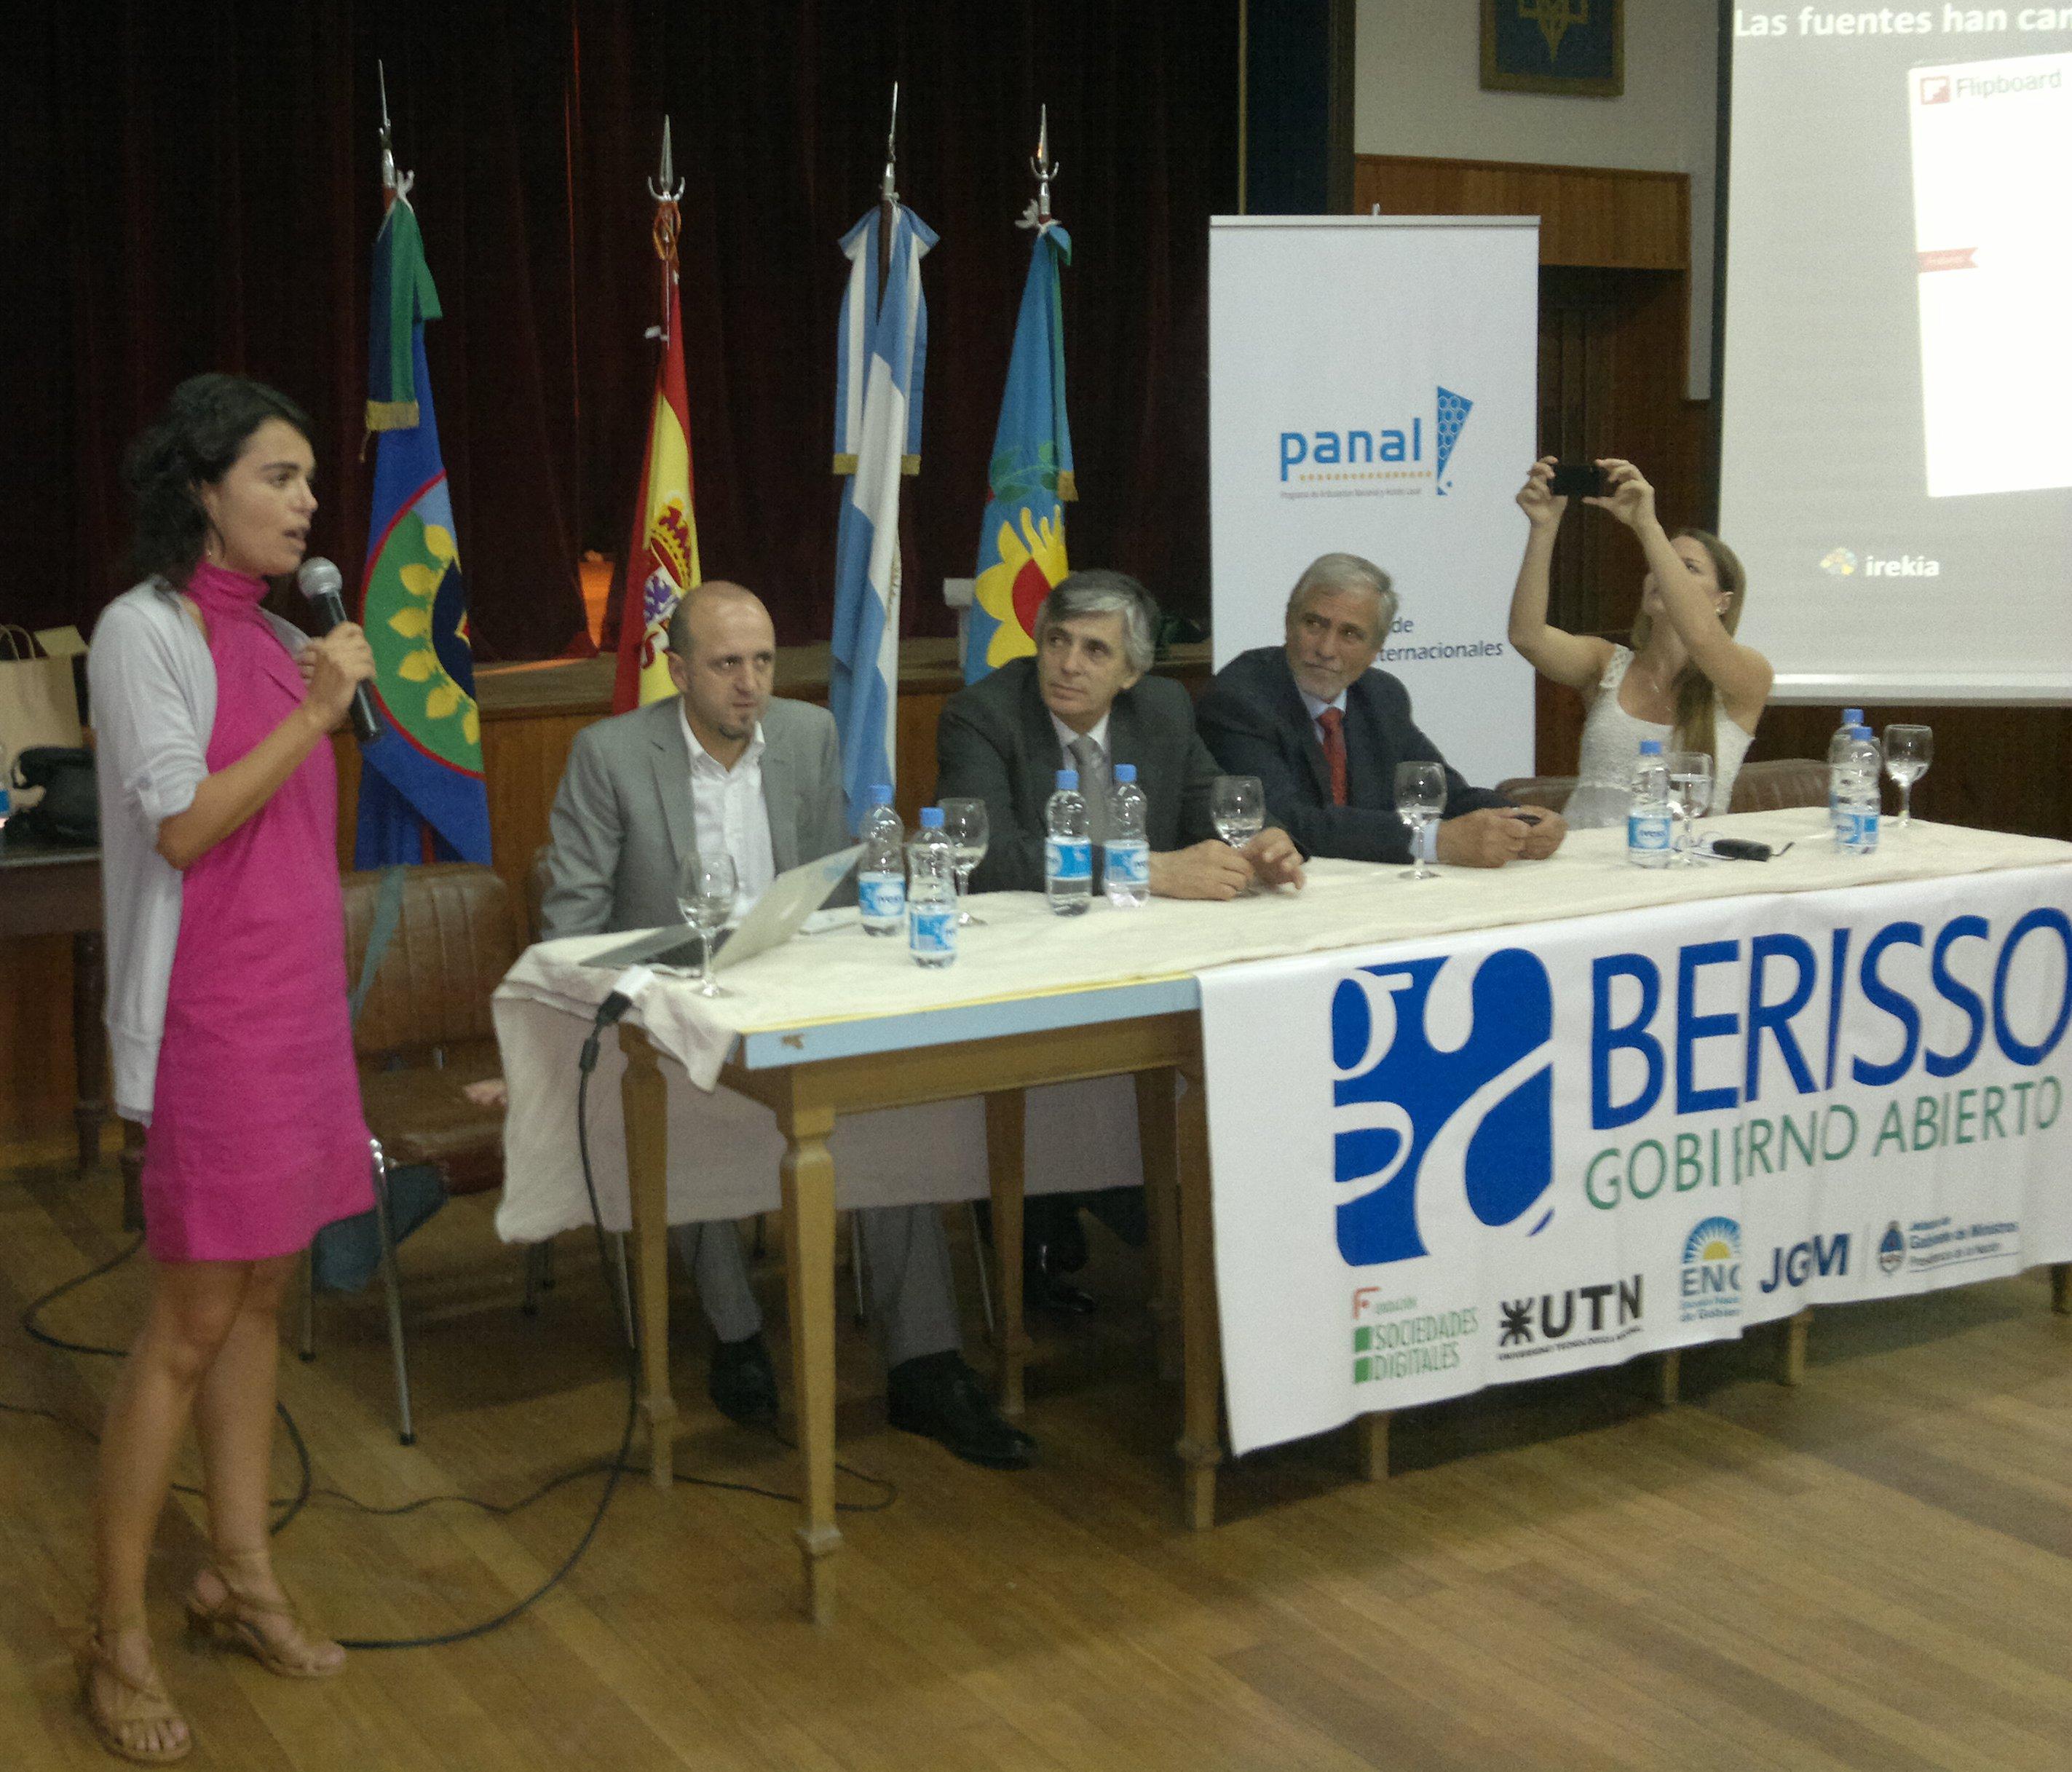 berisso6.jpg